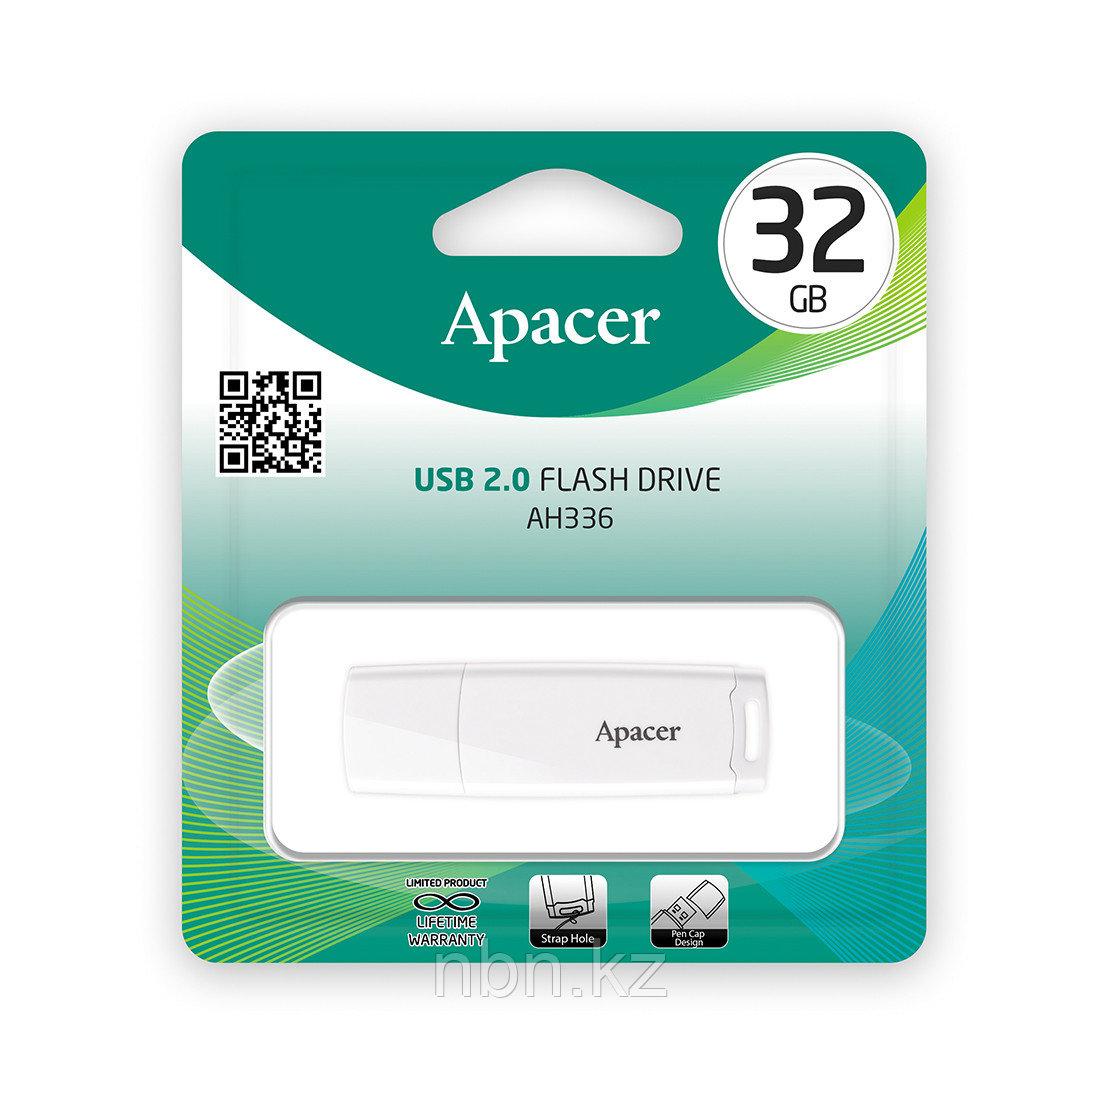 USB-накопитель Apacer AH336 32GB Белый - фото 2